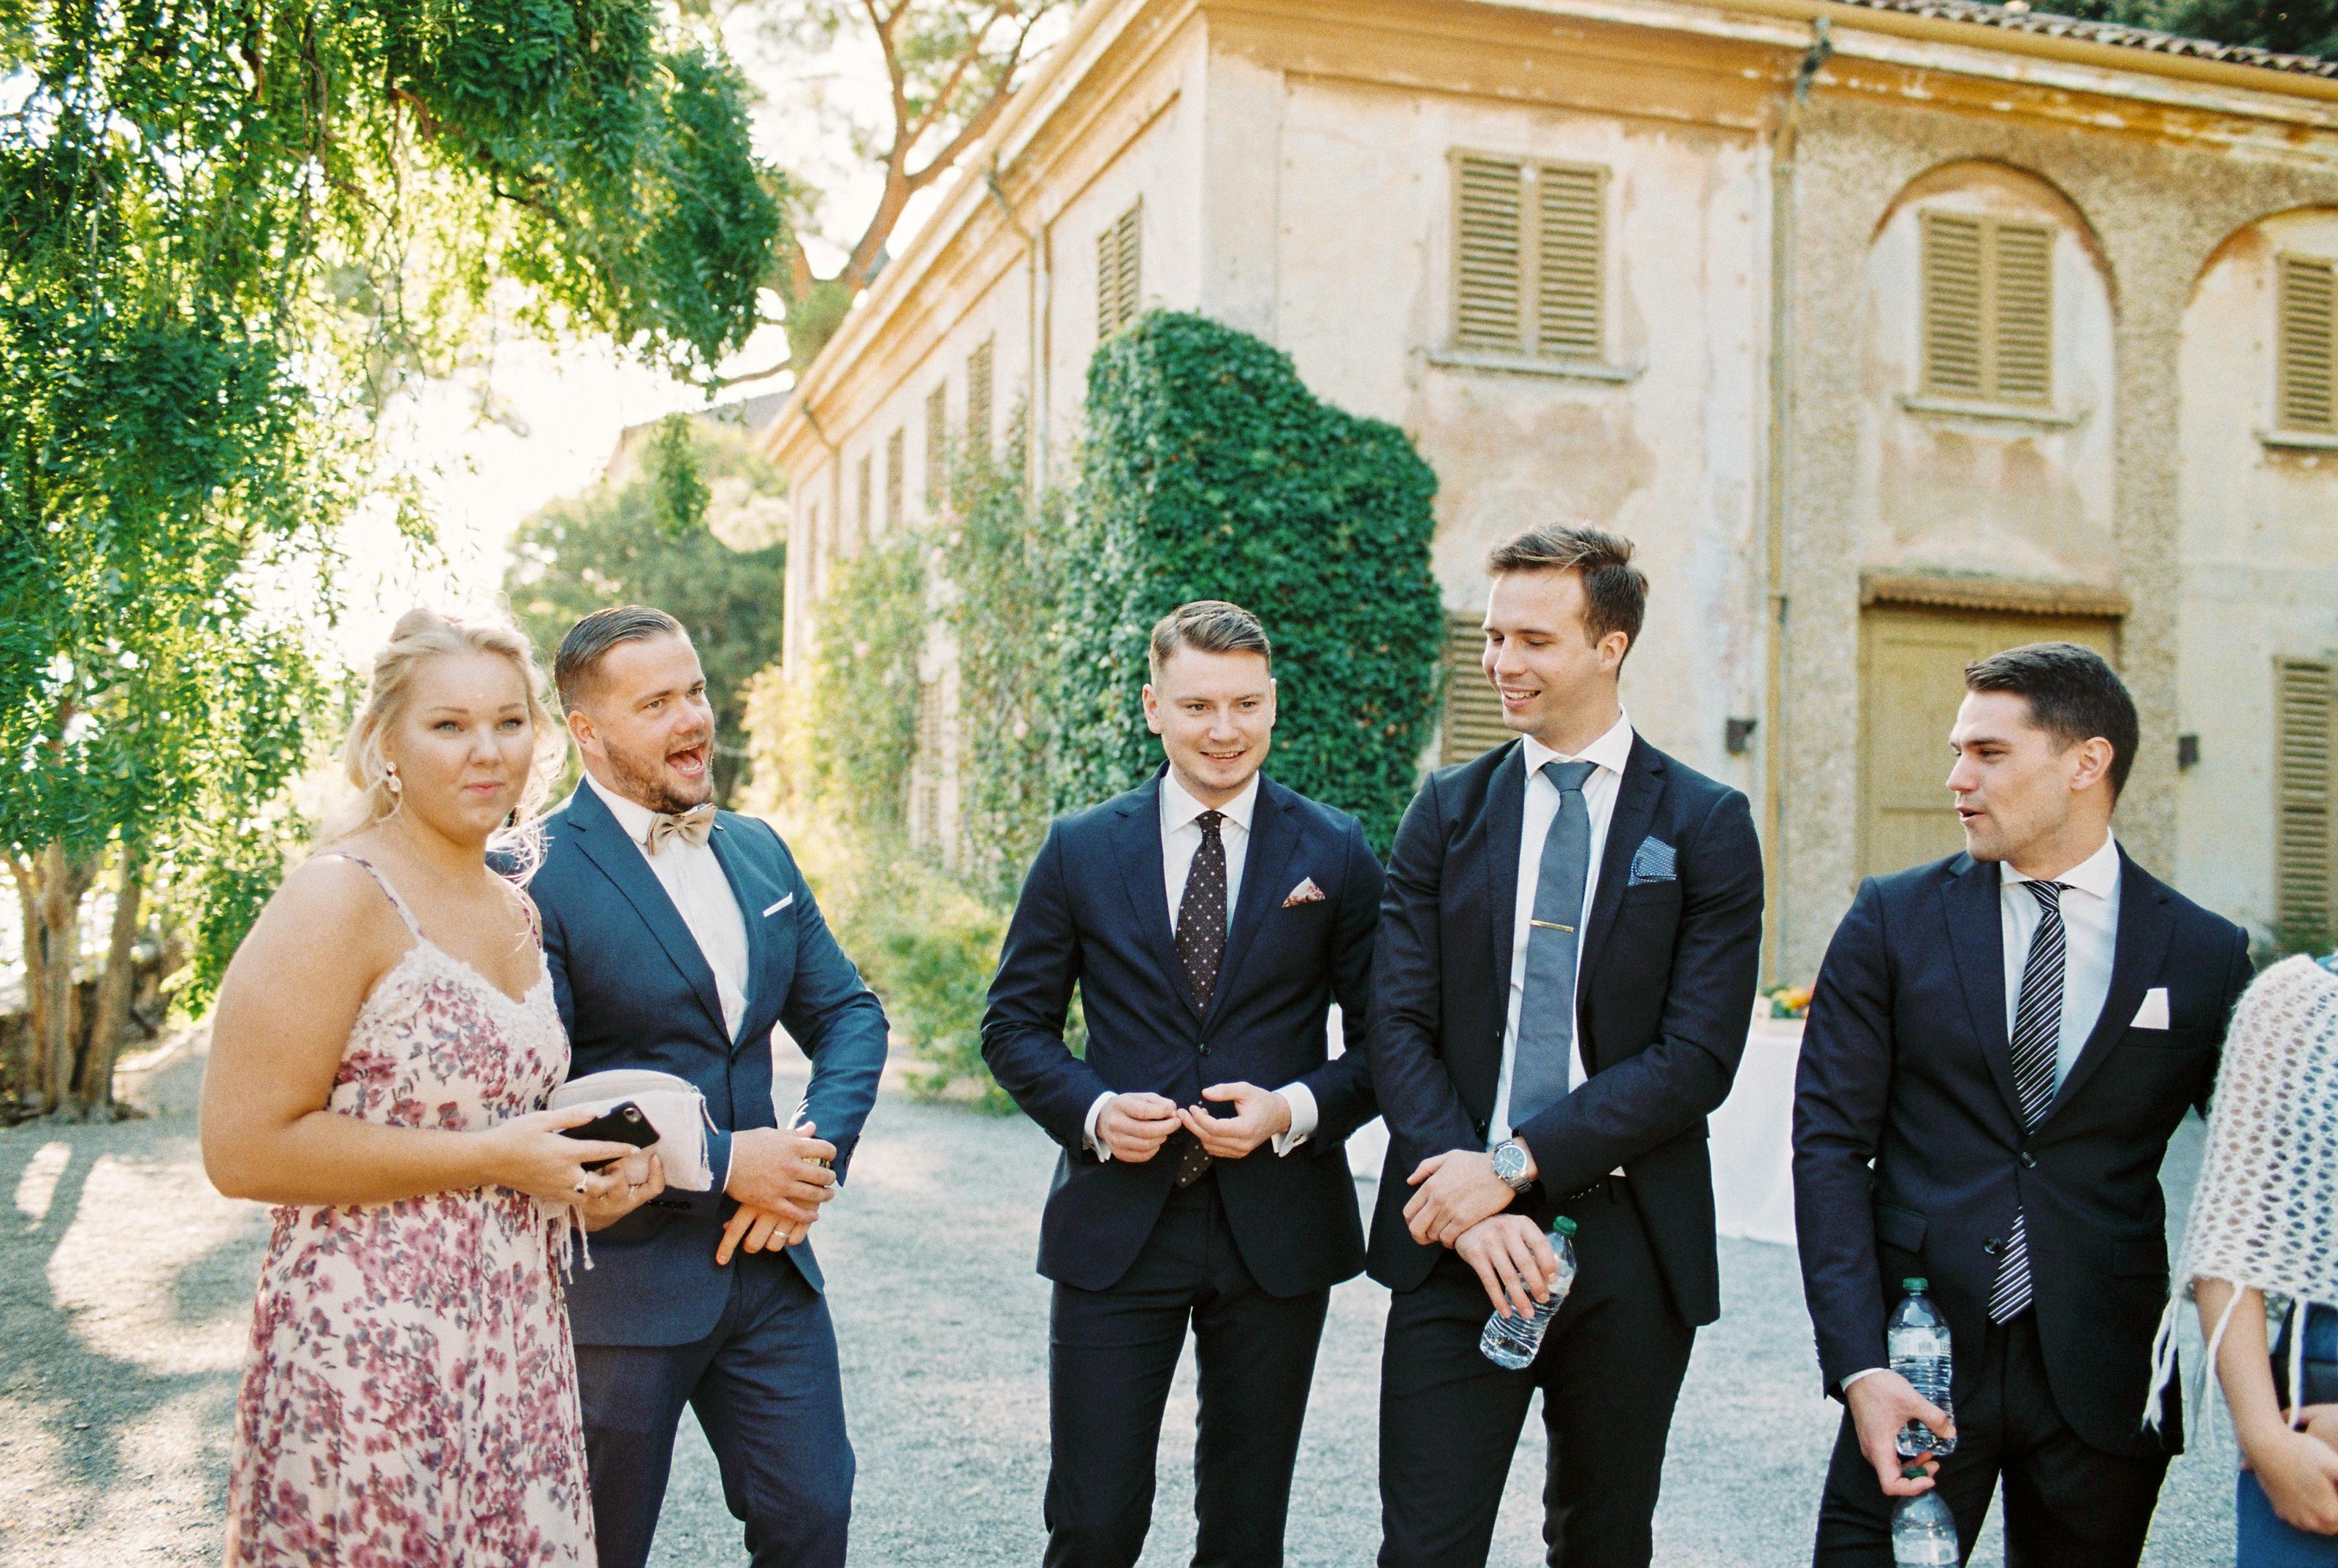 2 BridesPhotography_Molimenti_Wedding_47